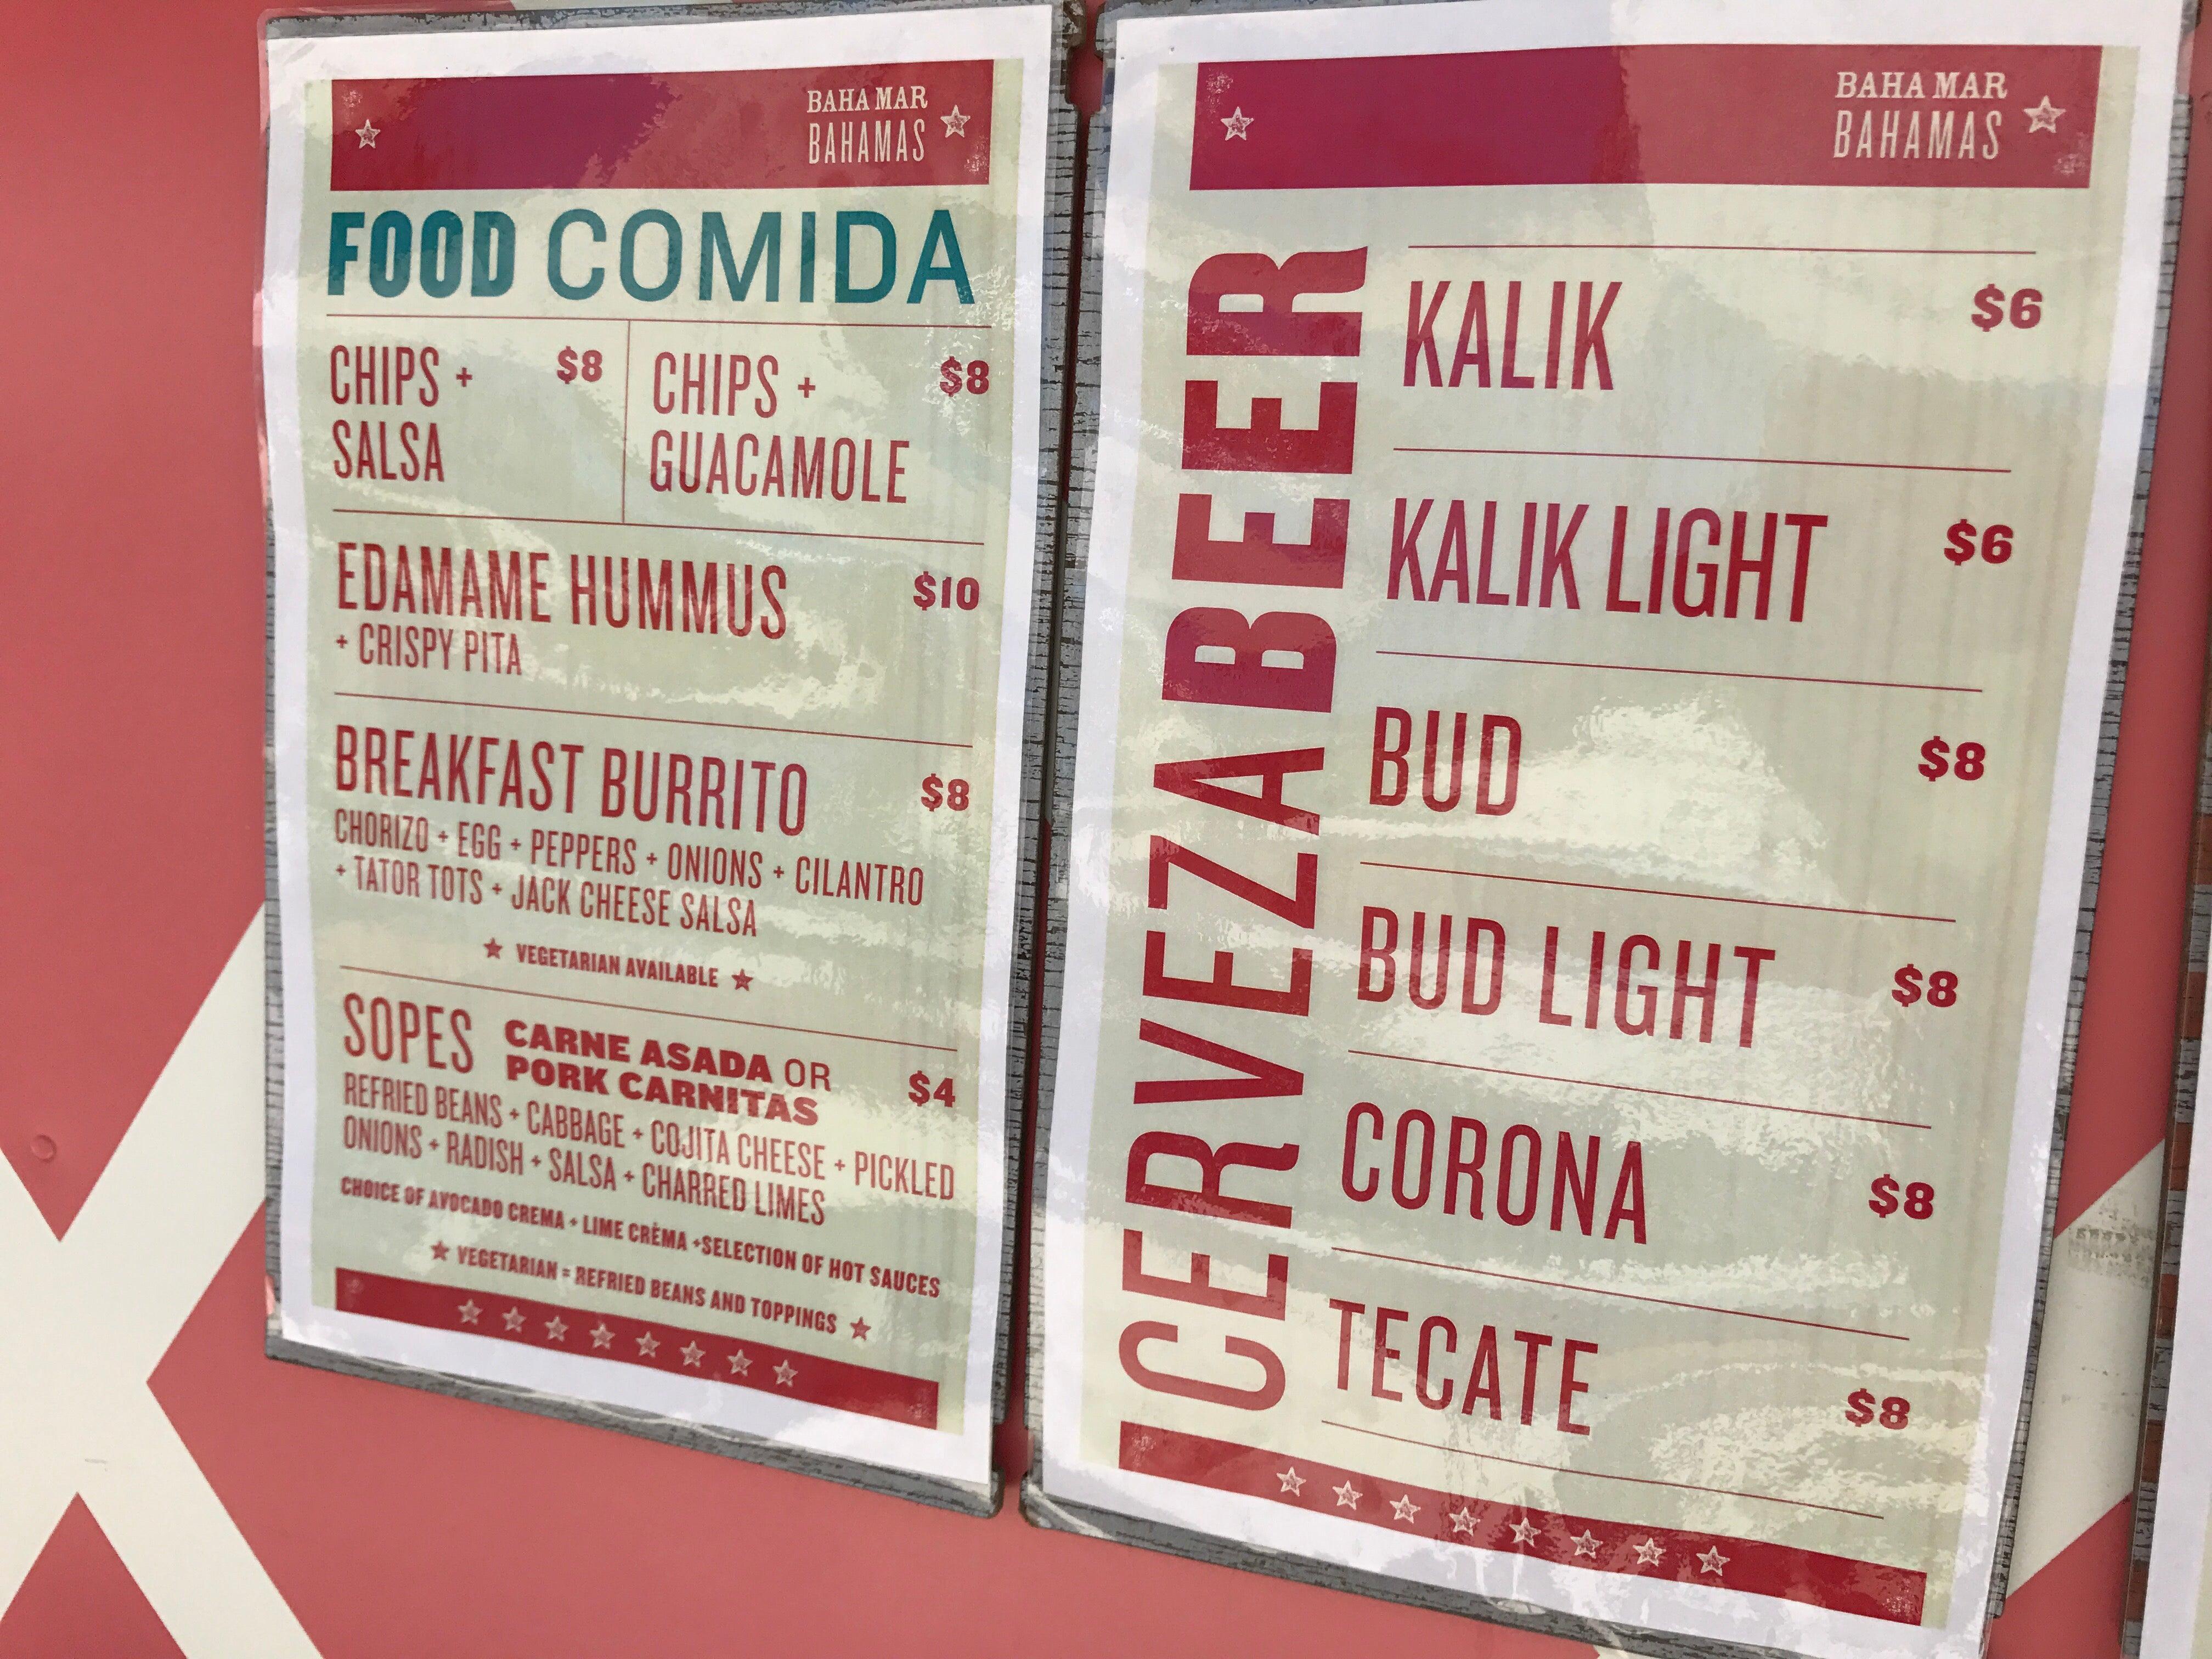 Grand Hyatt Baha Mar Kid S Club And Affordable Food Choices